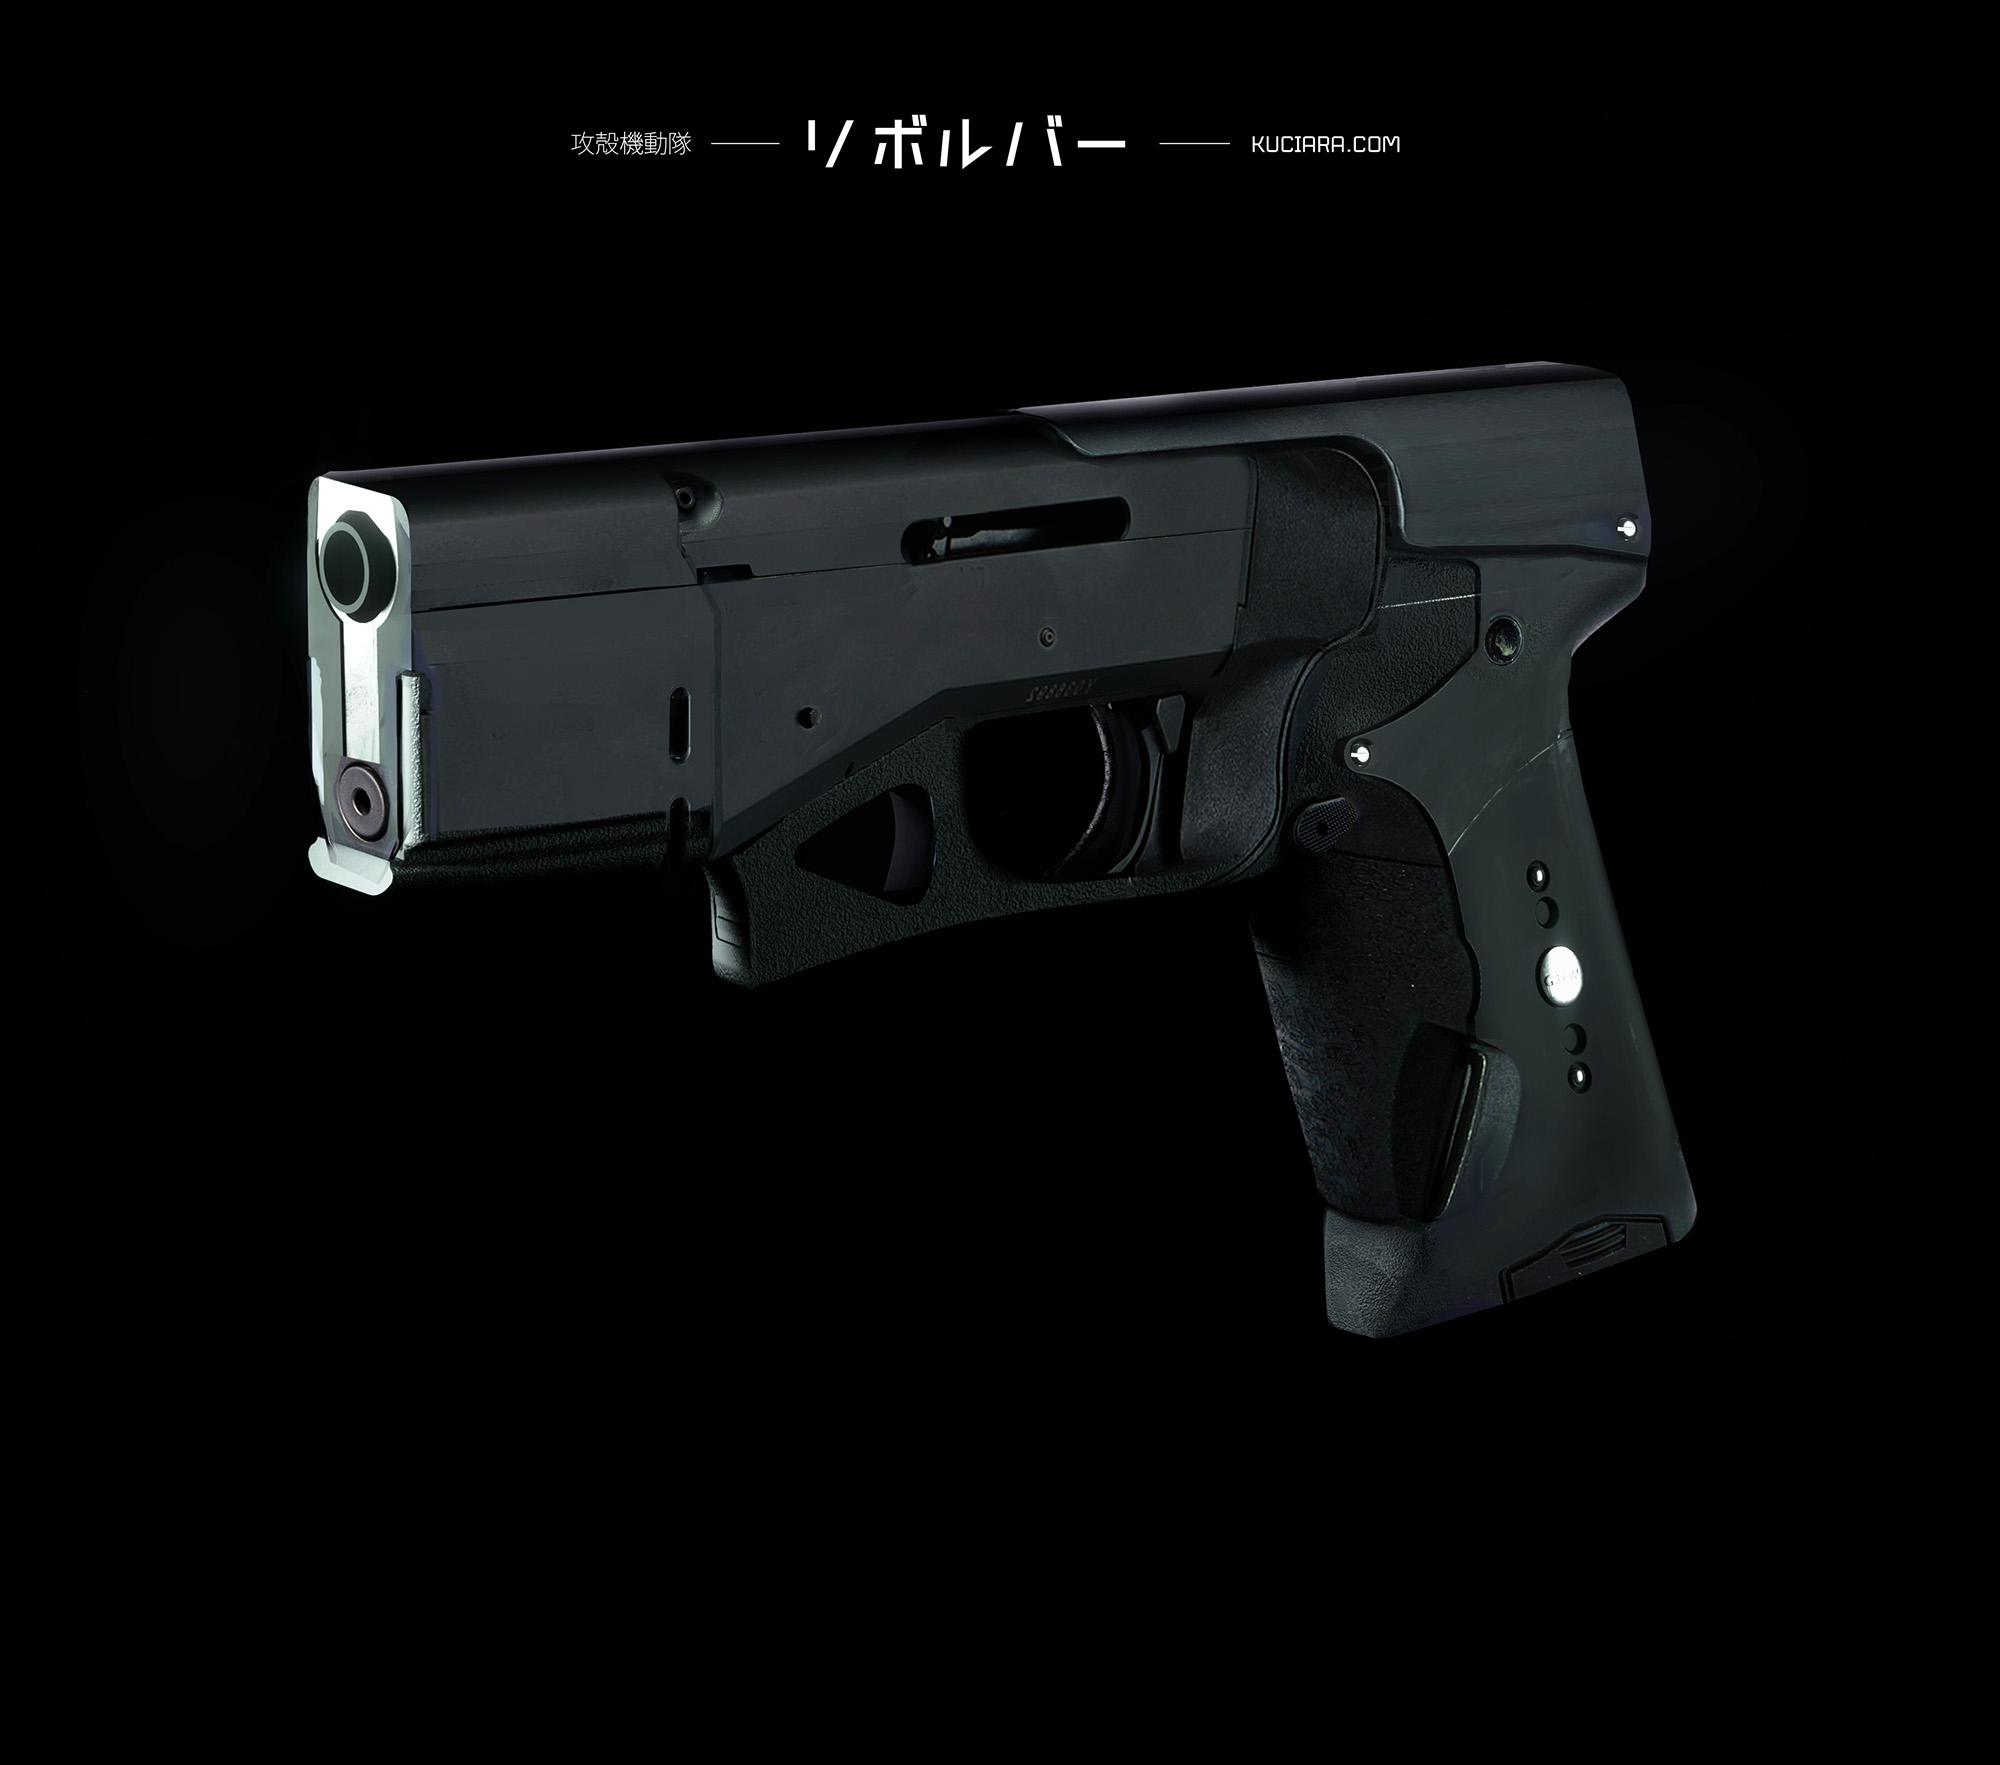 092115_WPN_Major_Pistol_MK_v001A.jpg